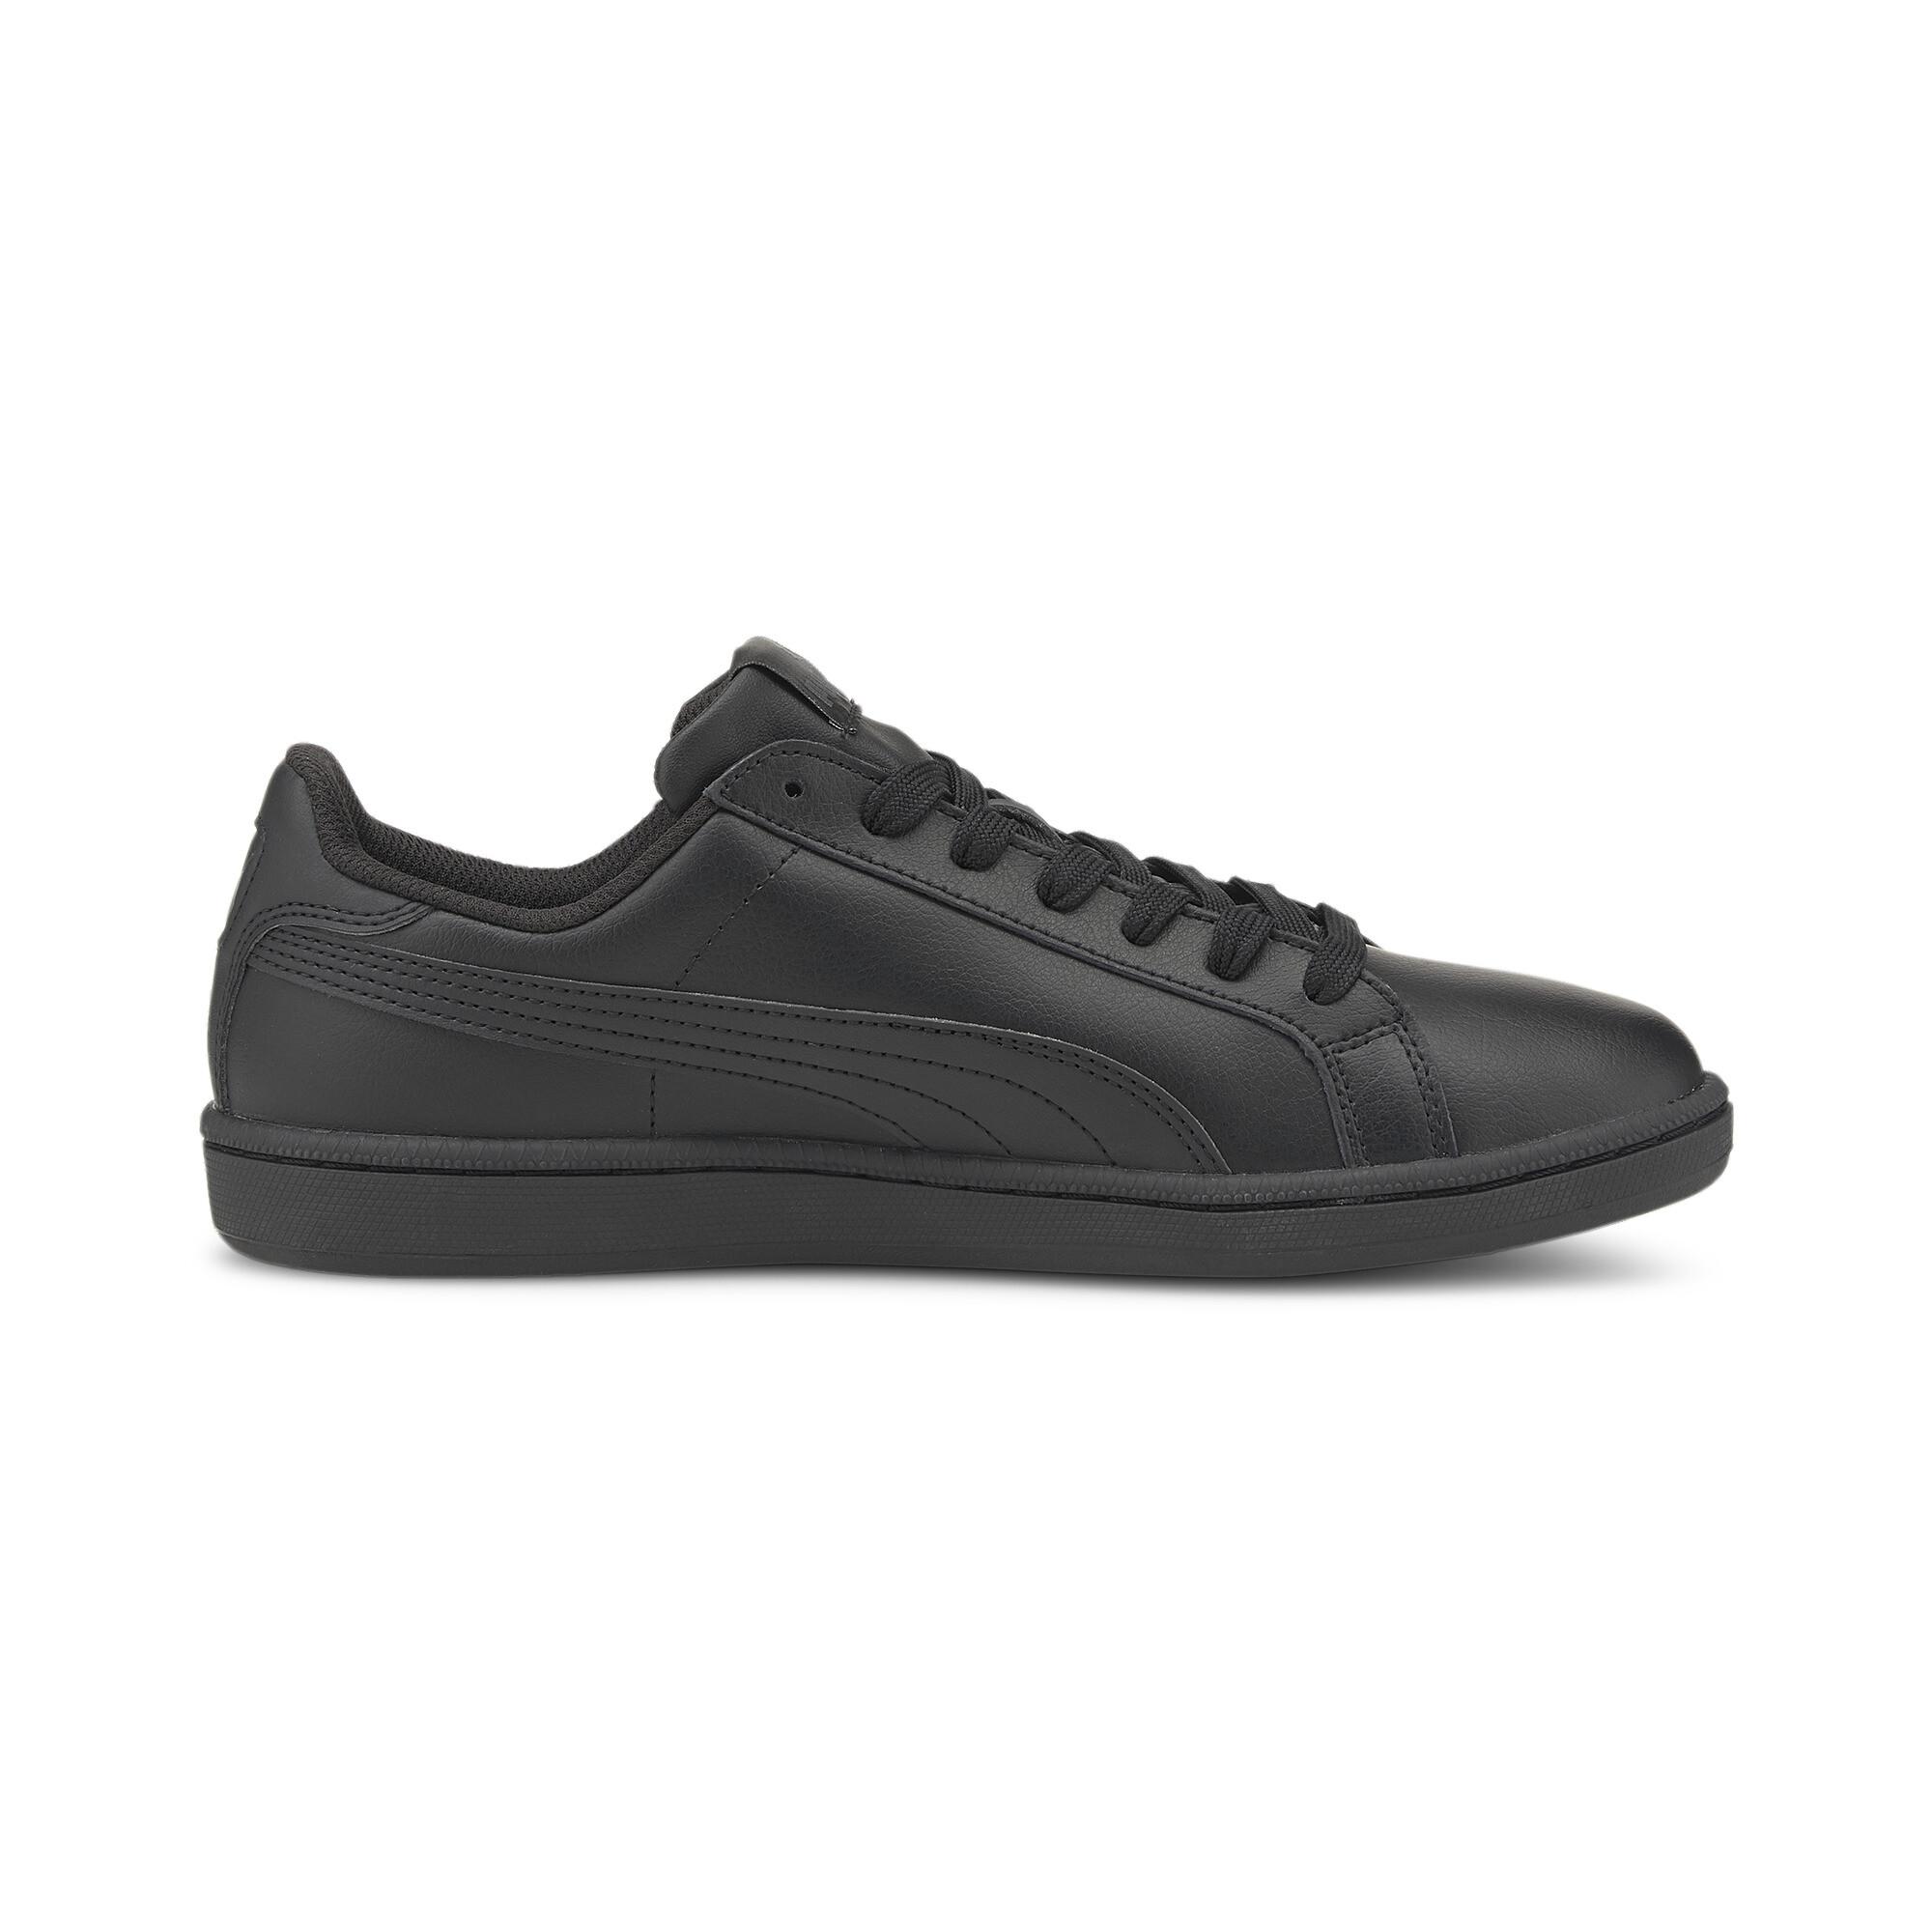 PUMA-Smash-Trainers-Schuhe-Sneakers-Sport-Classics-Unisex-Neu Indexbild 6